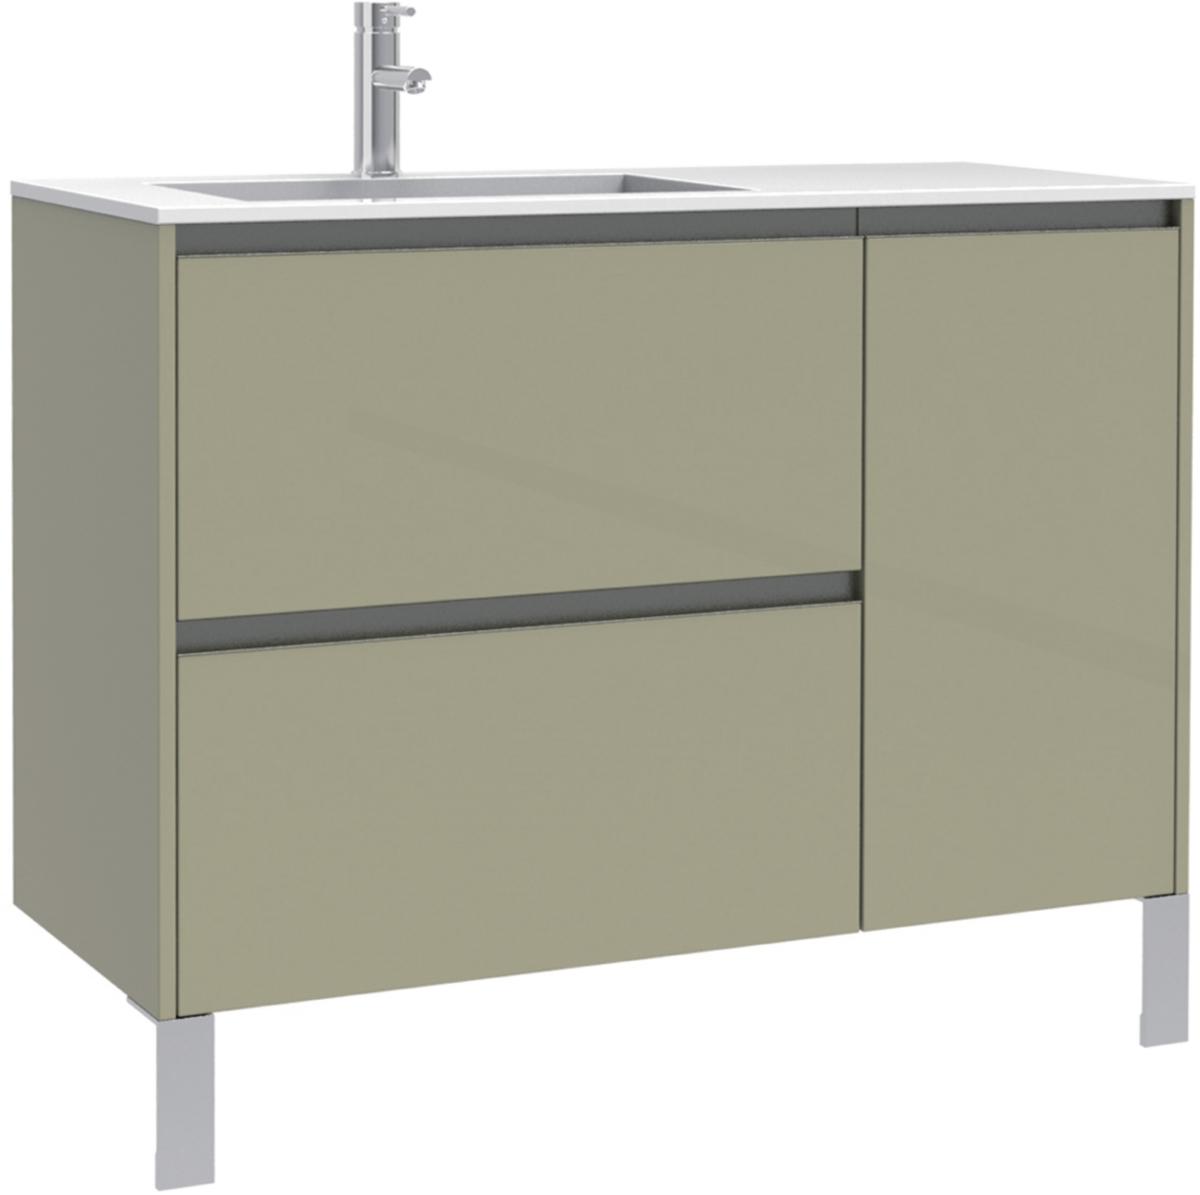 Meuble sous vasque plenitude 105cm 2 tiroirs 1 porte pour for Reparer porte meuble salle de bain